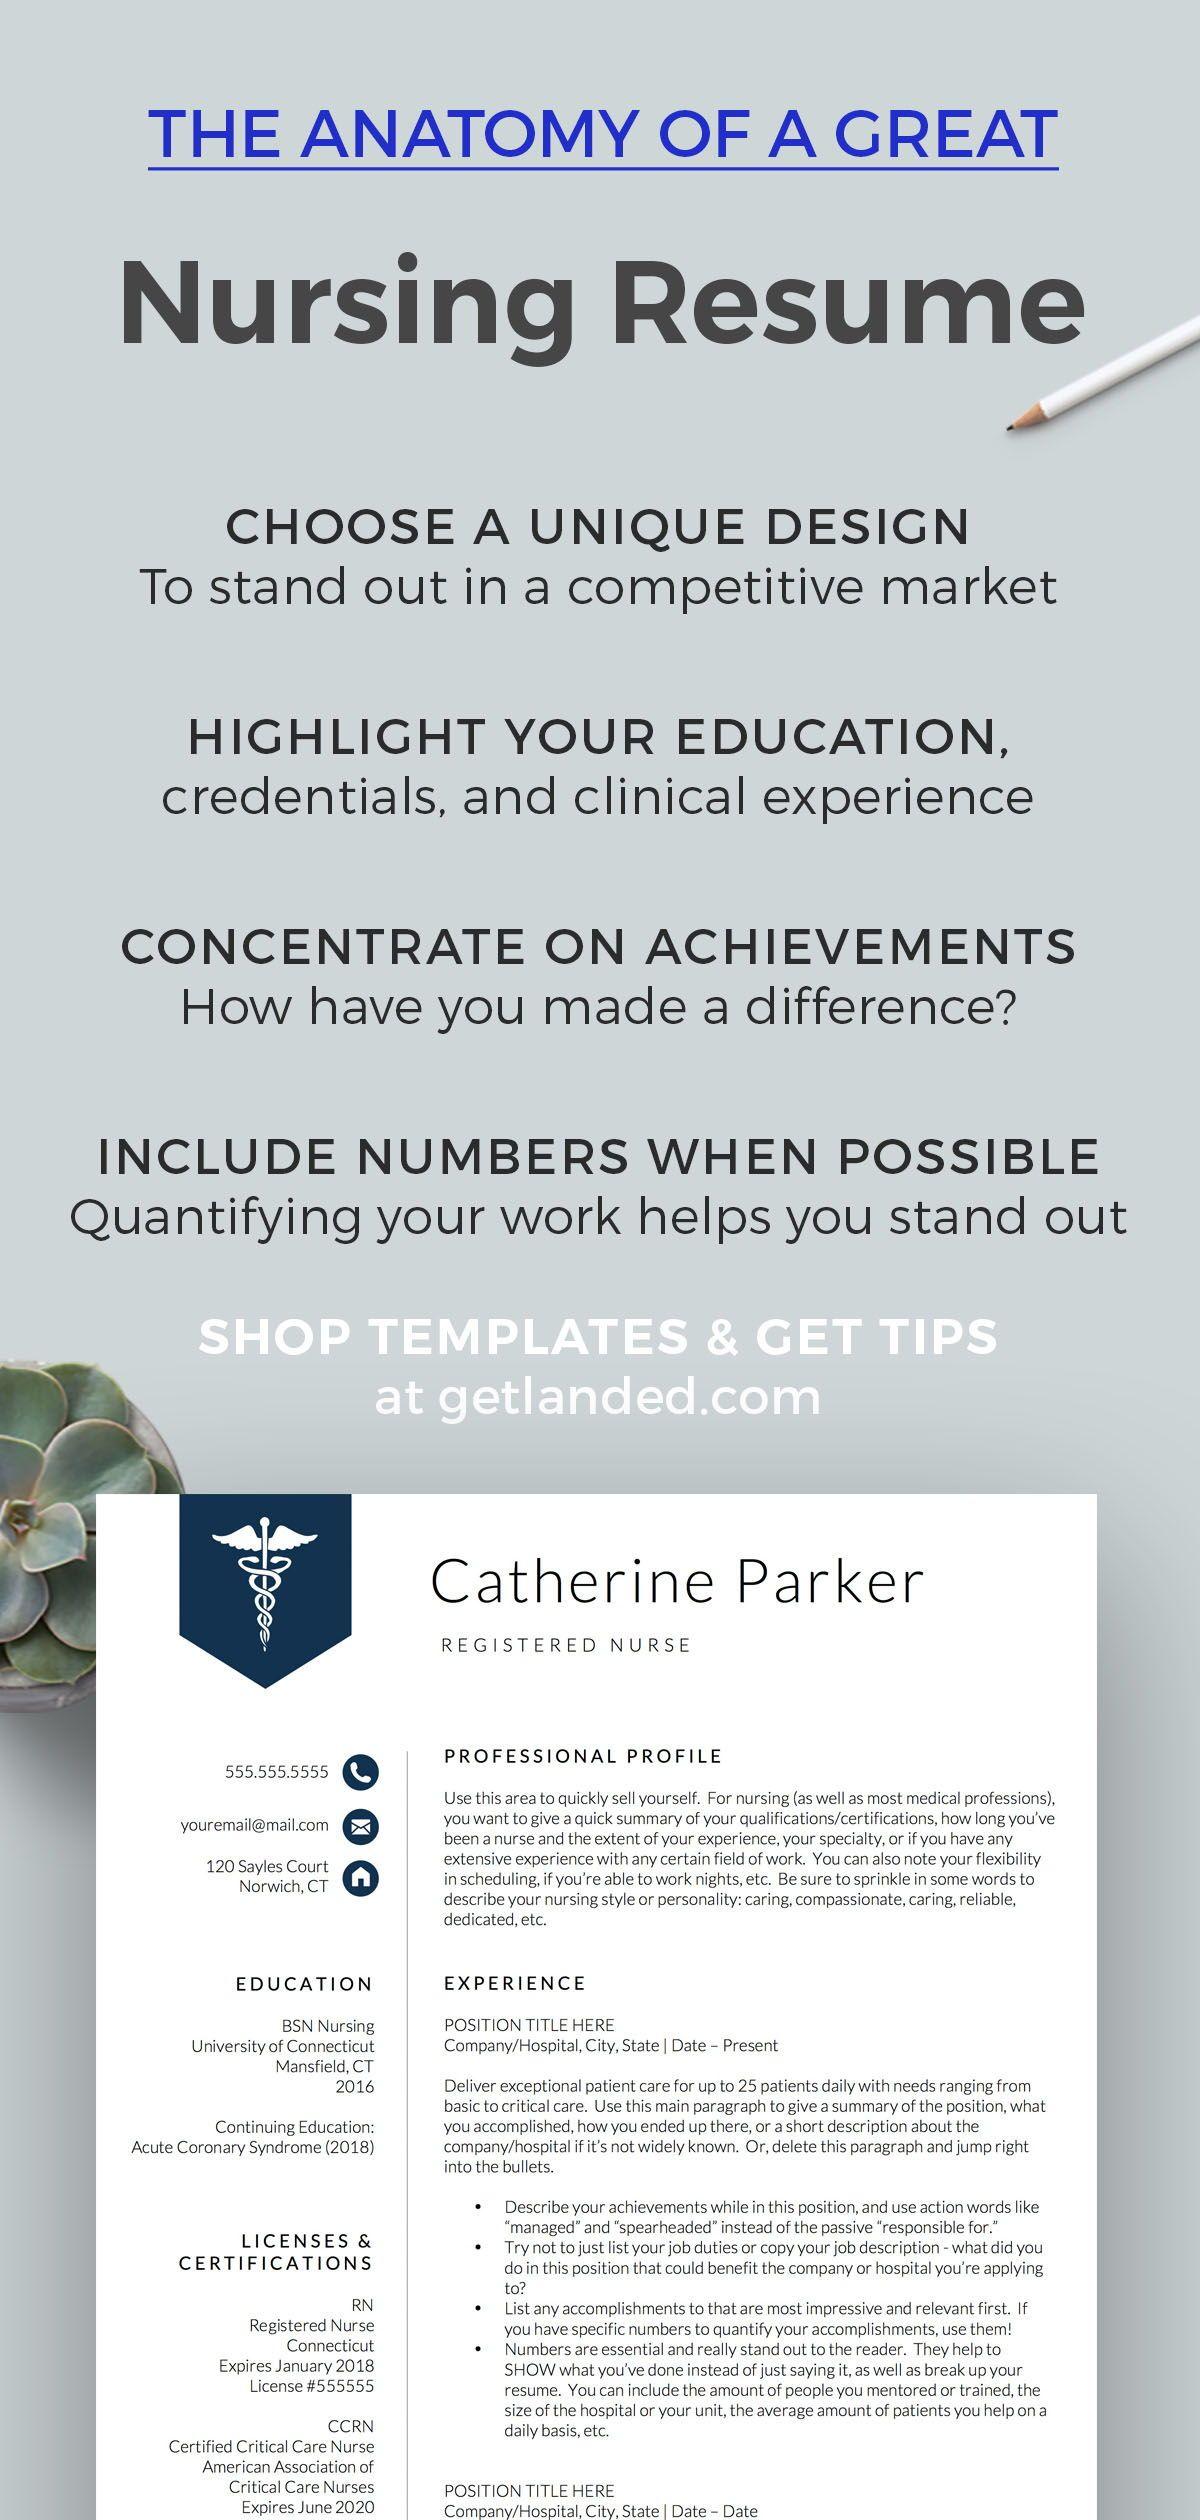 Nursing Resume Template for Word & Pages Nurse Resume